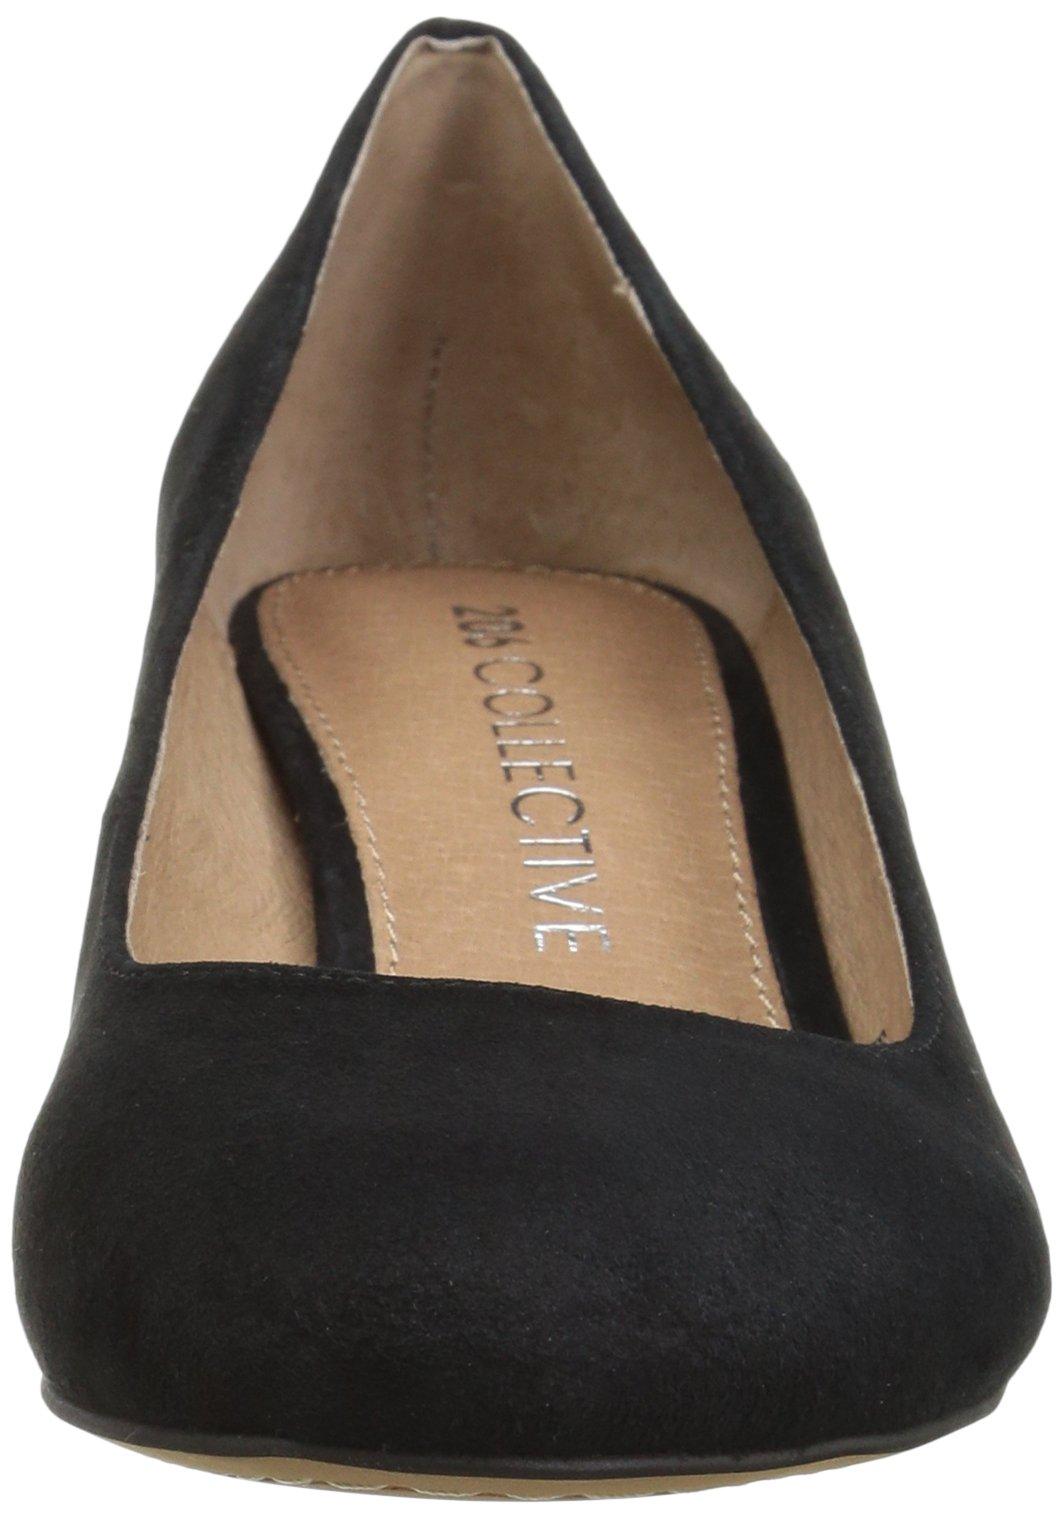 206 Collective Women's Merritt Round Toe Block Heel Low Pump, Black Suede, 7.5 B US by 206 Collective (Image #4)